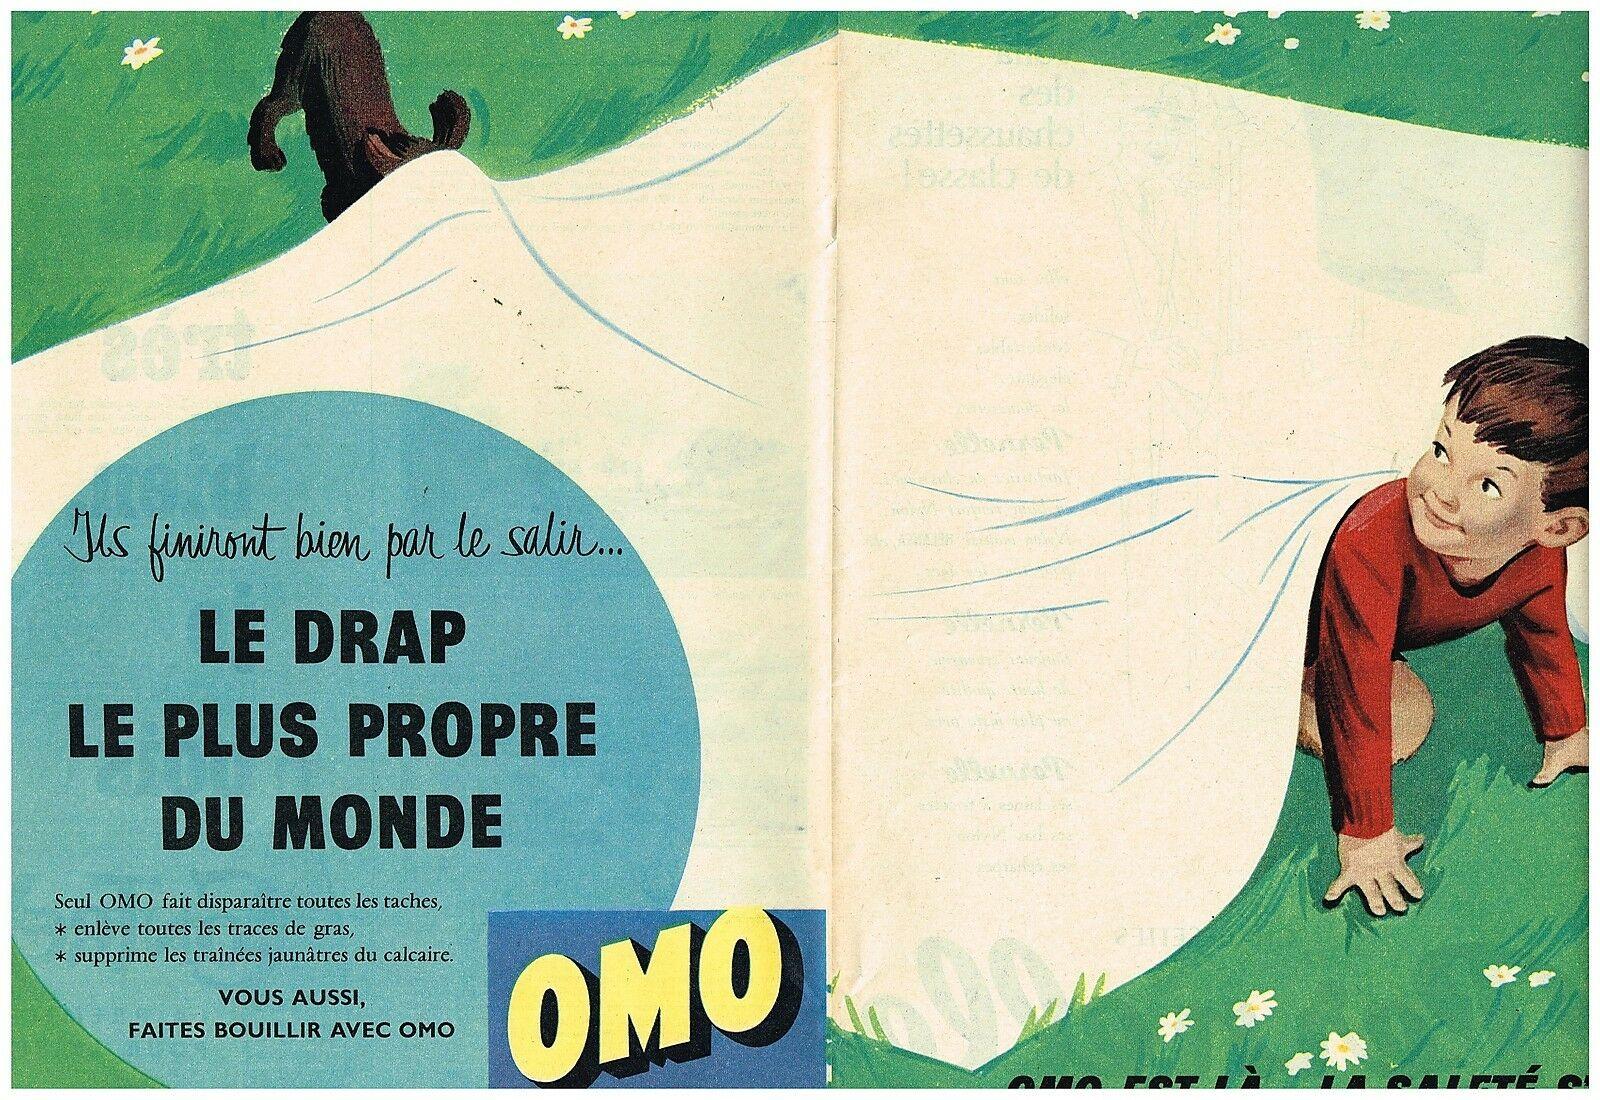 Lessive OMO 1957